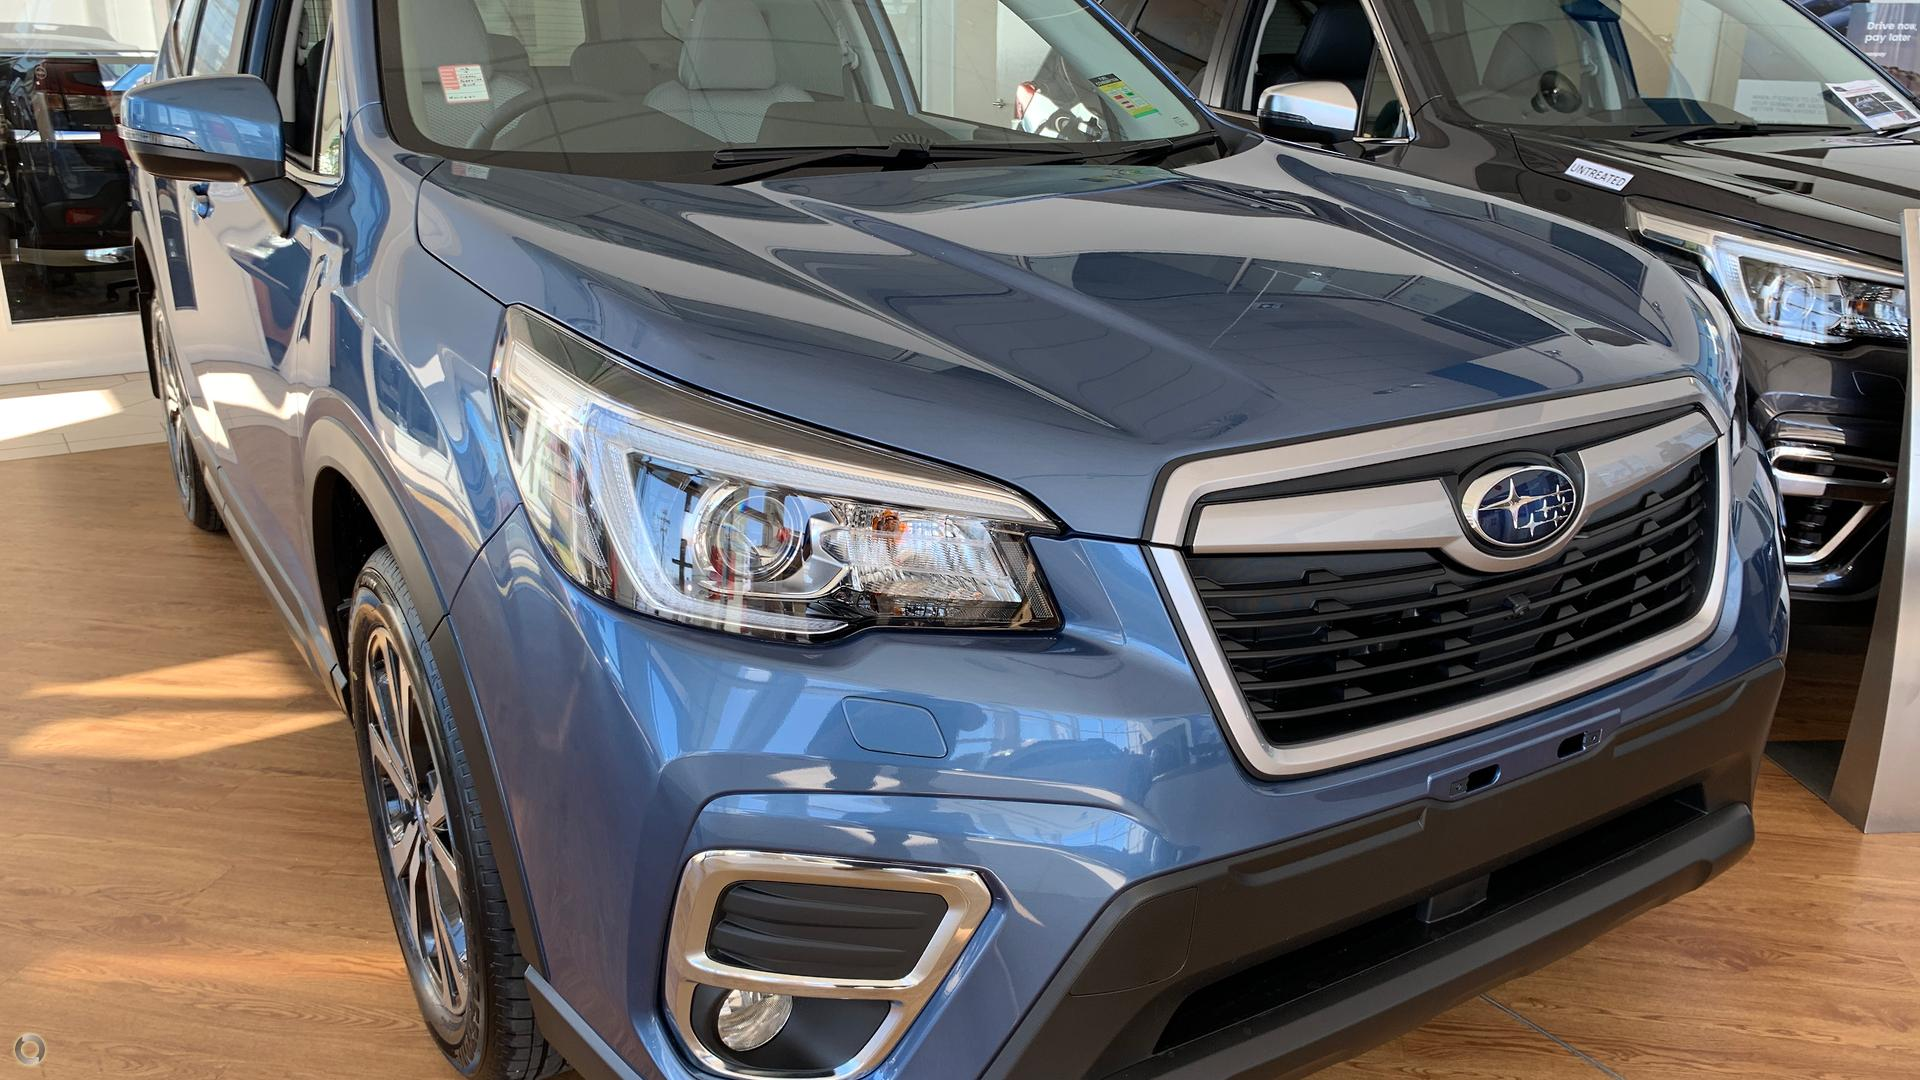 2019 Subaru Forester S5